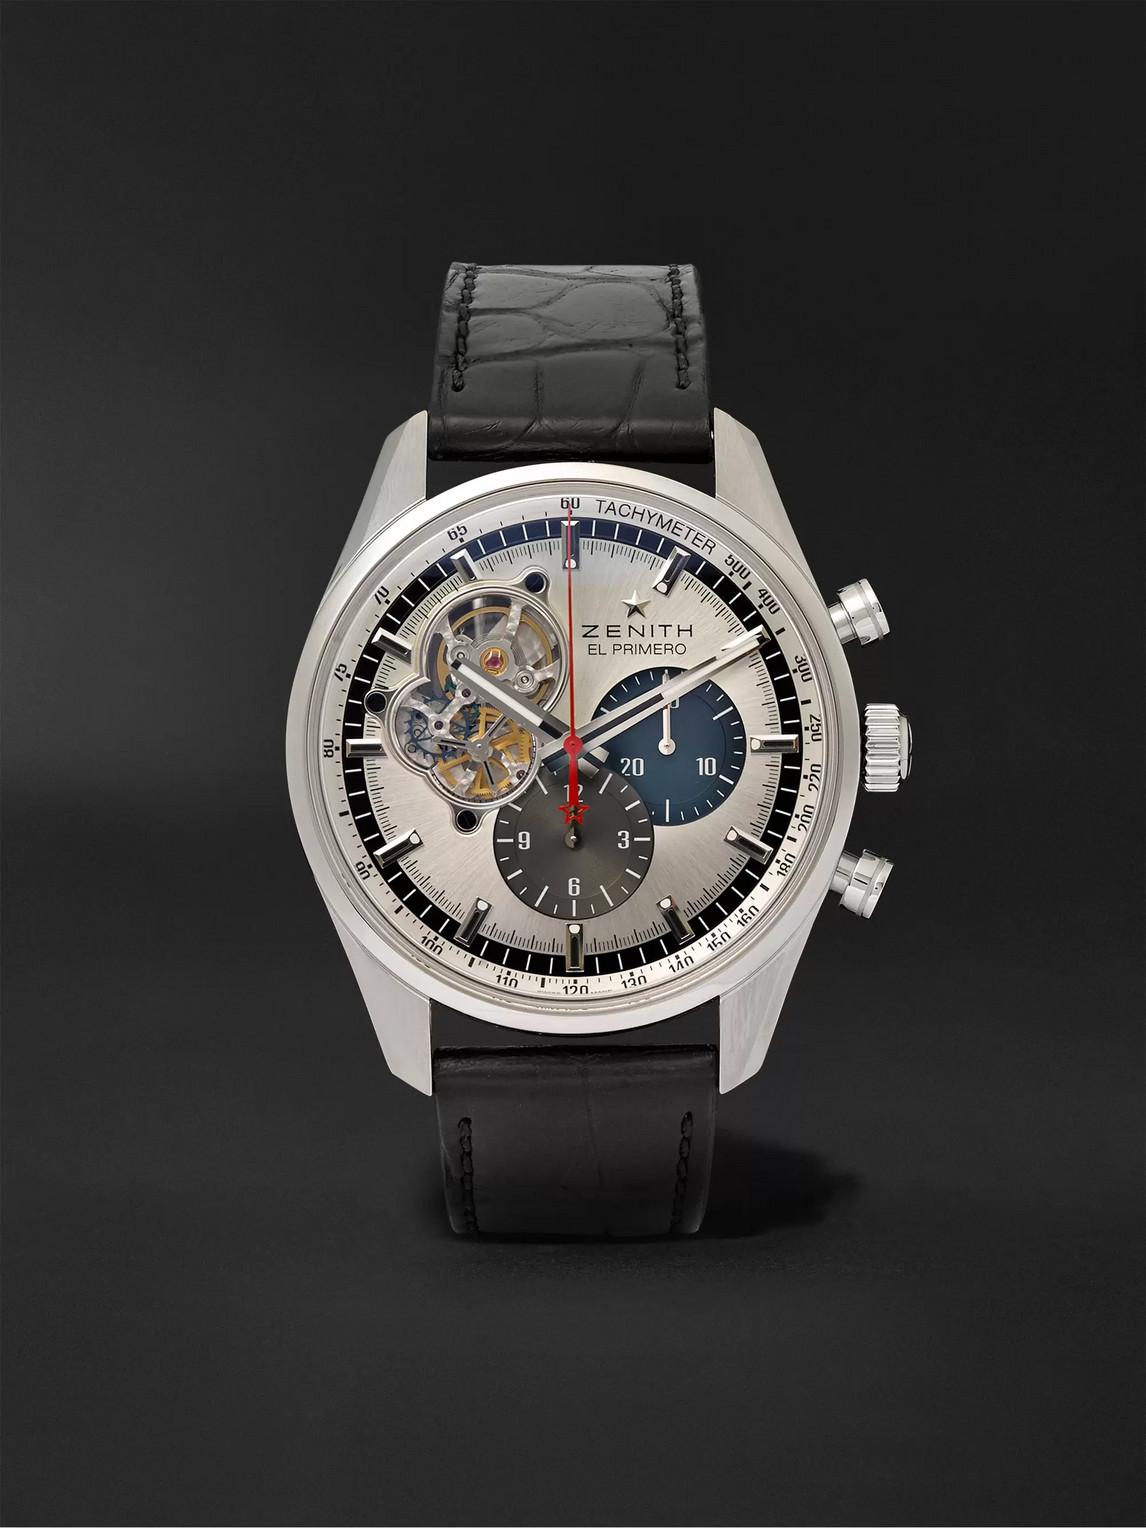 Zenith - El Primero Chronomaster 1969 42mm Stainless Steel and Alligator Watch, Ref. No. 03.2040.4061/69.C496 - Men - Silver